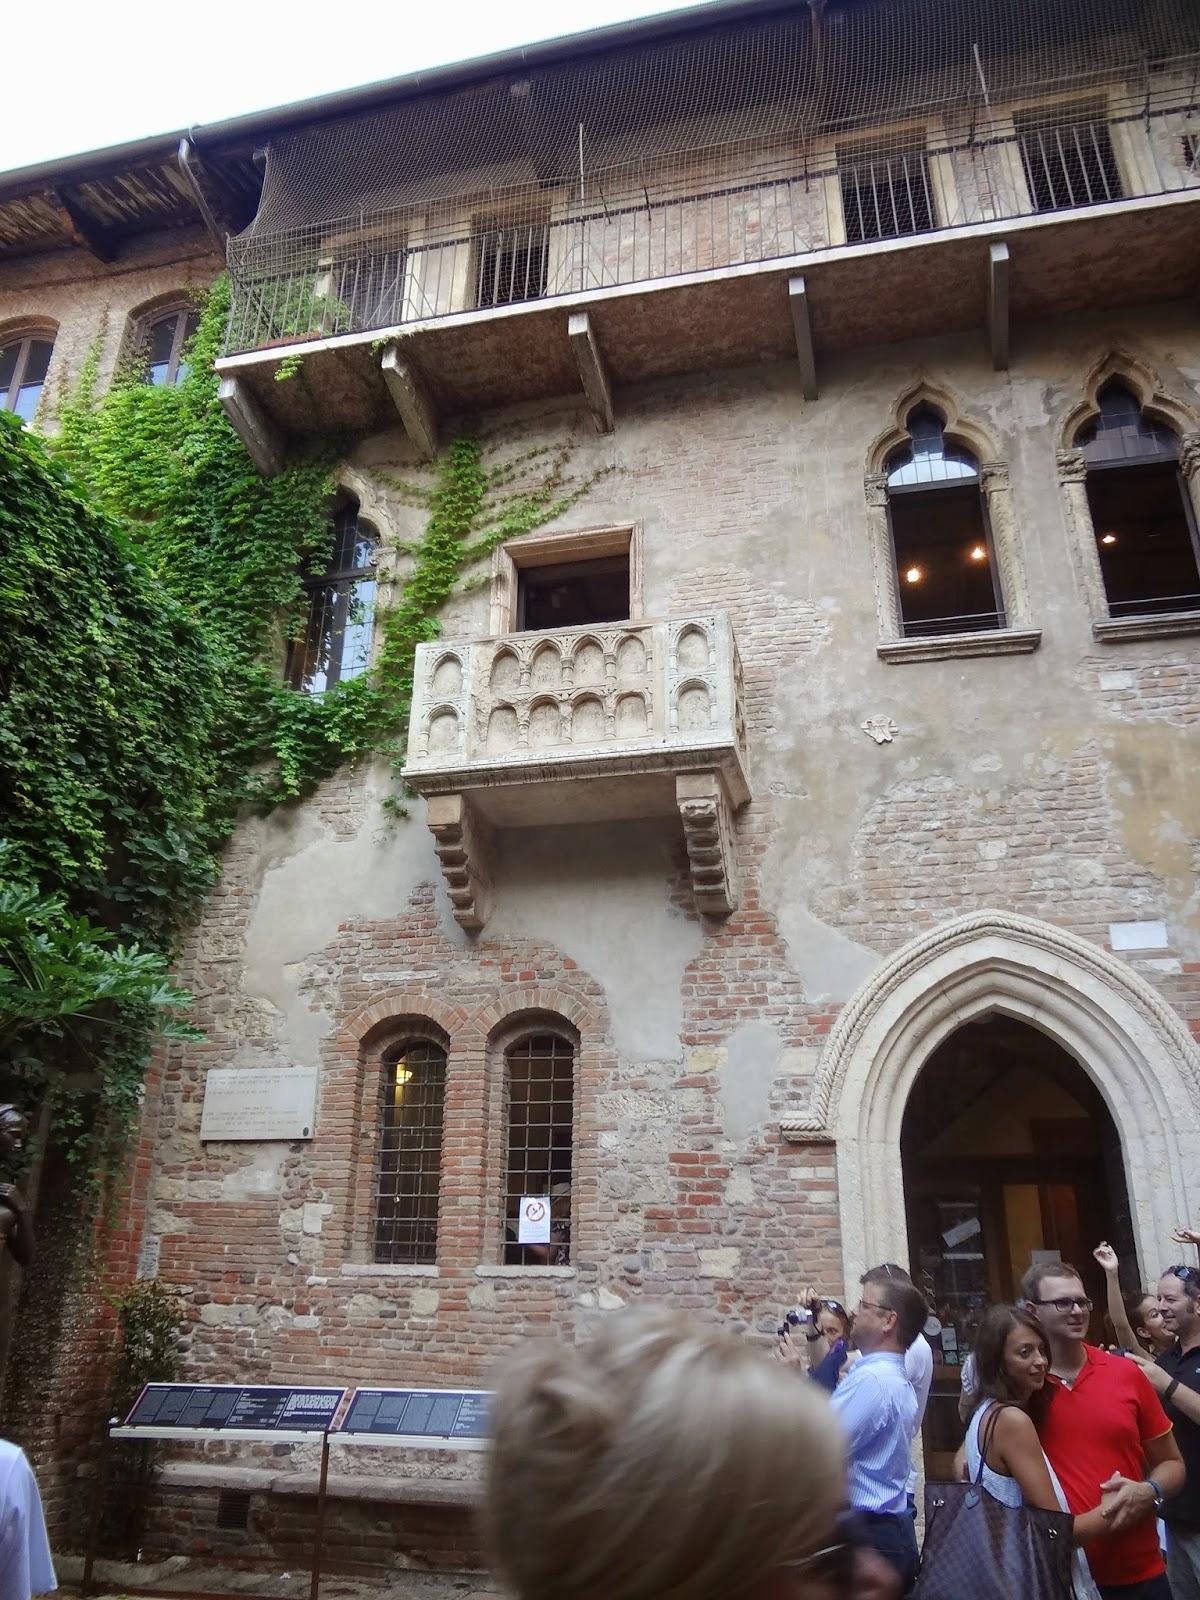 Balcón de Julieta - Casa de Julieta. Verona Italia